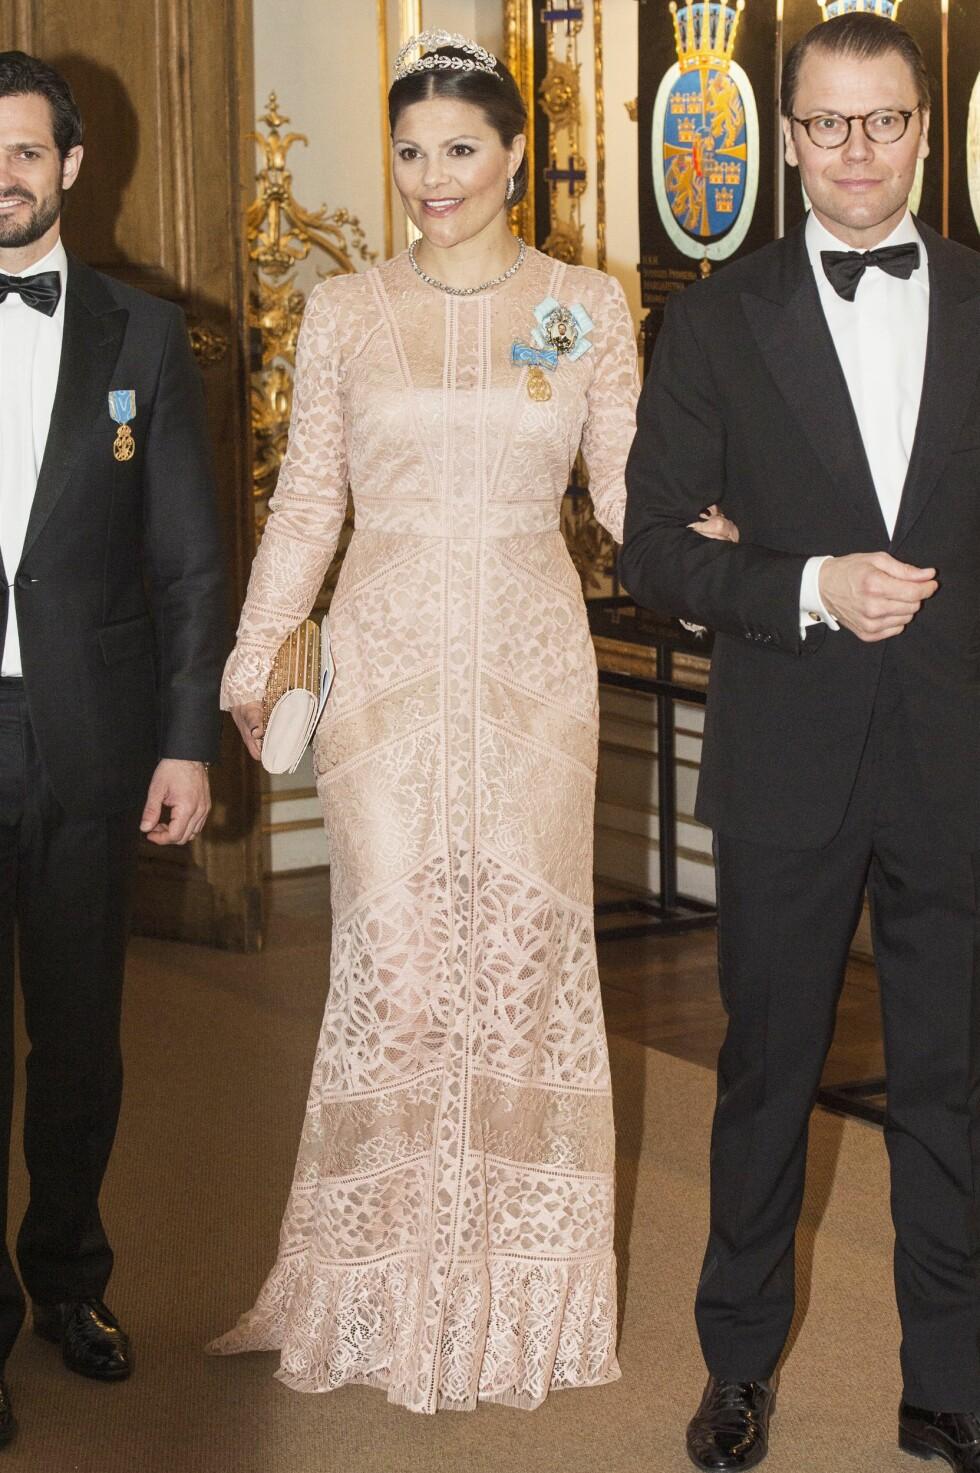 SE, SÅ FLOTT: Kronprinsesse Victoria fødte for 8 uker siden. Foto: Aftonbladet